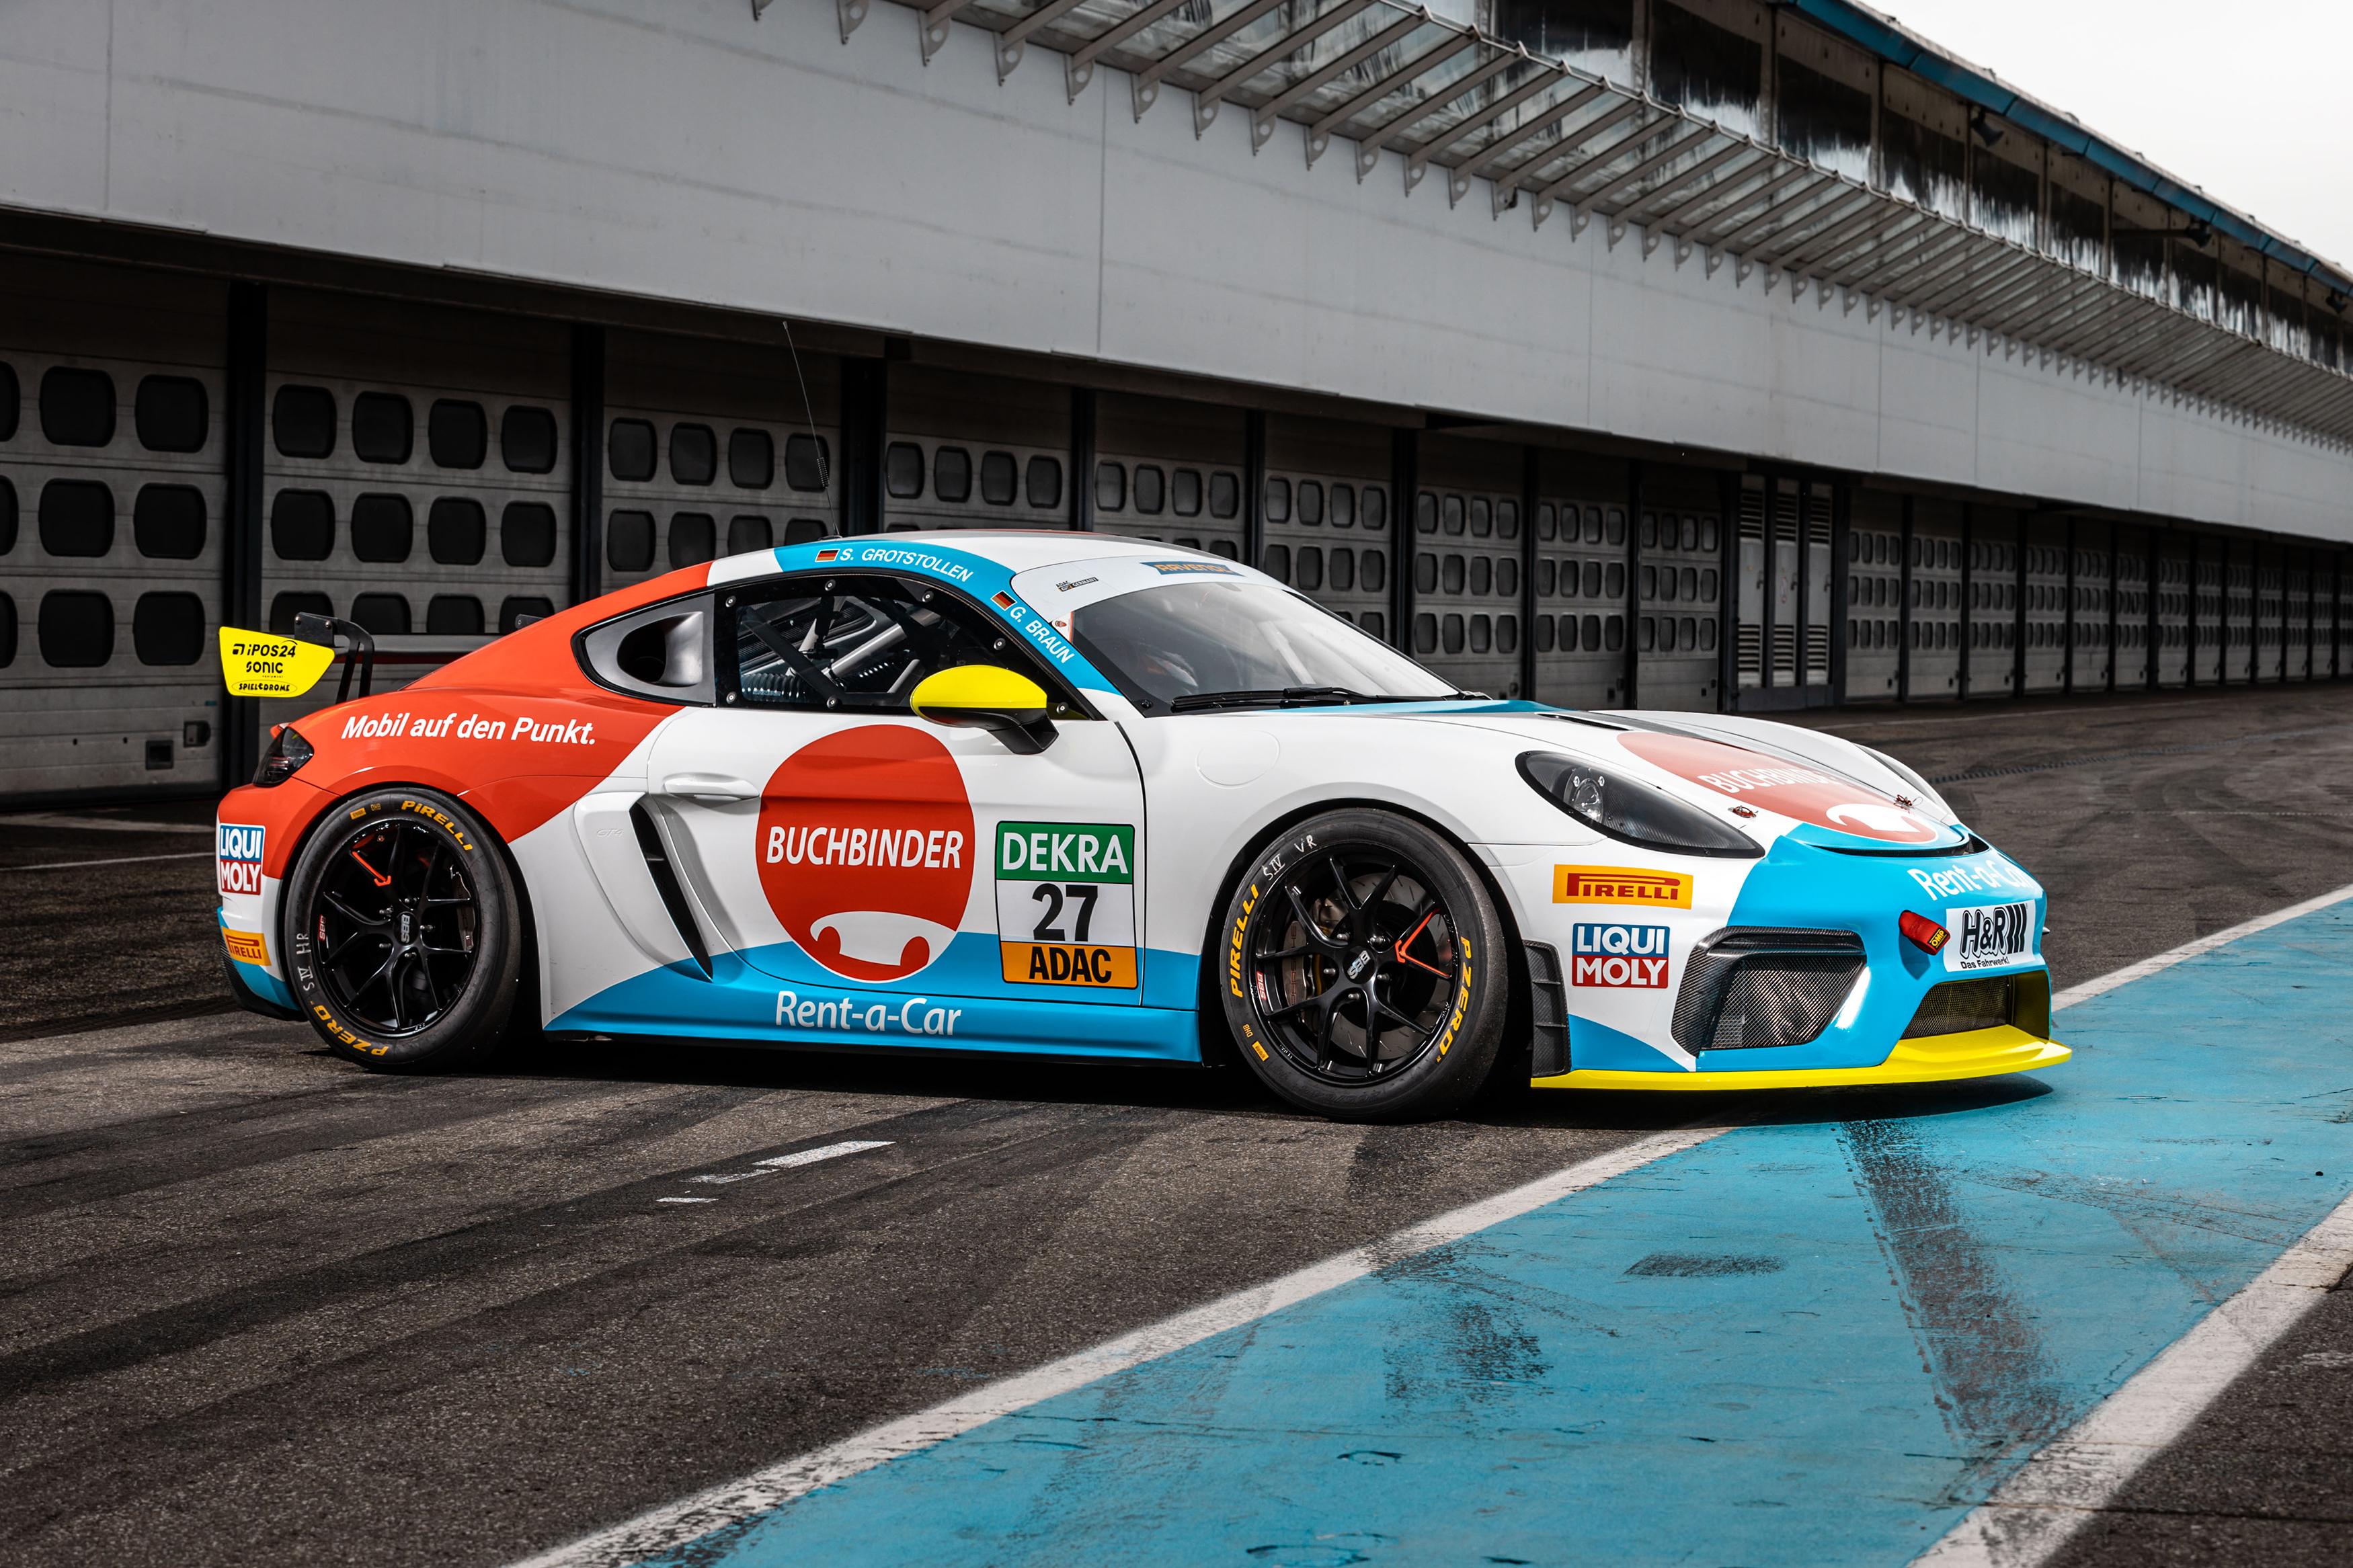 Team Buchbinder Rent-a-Car startet mit Porsche 718 Cayman